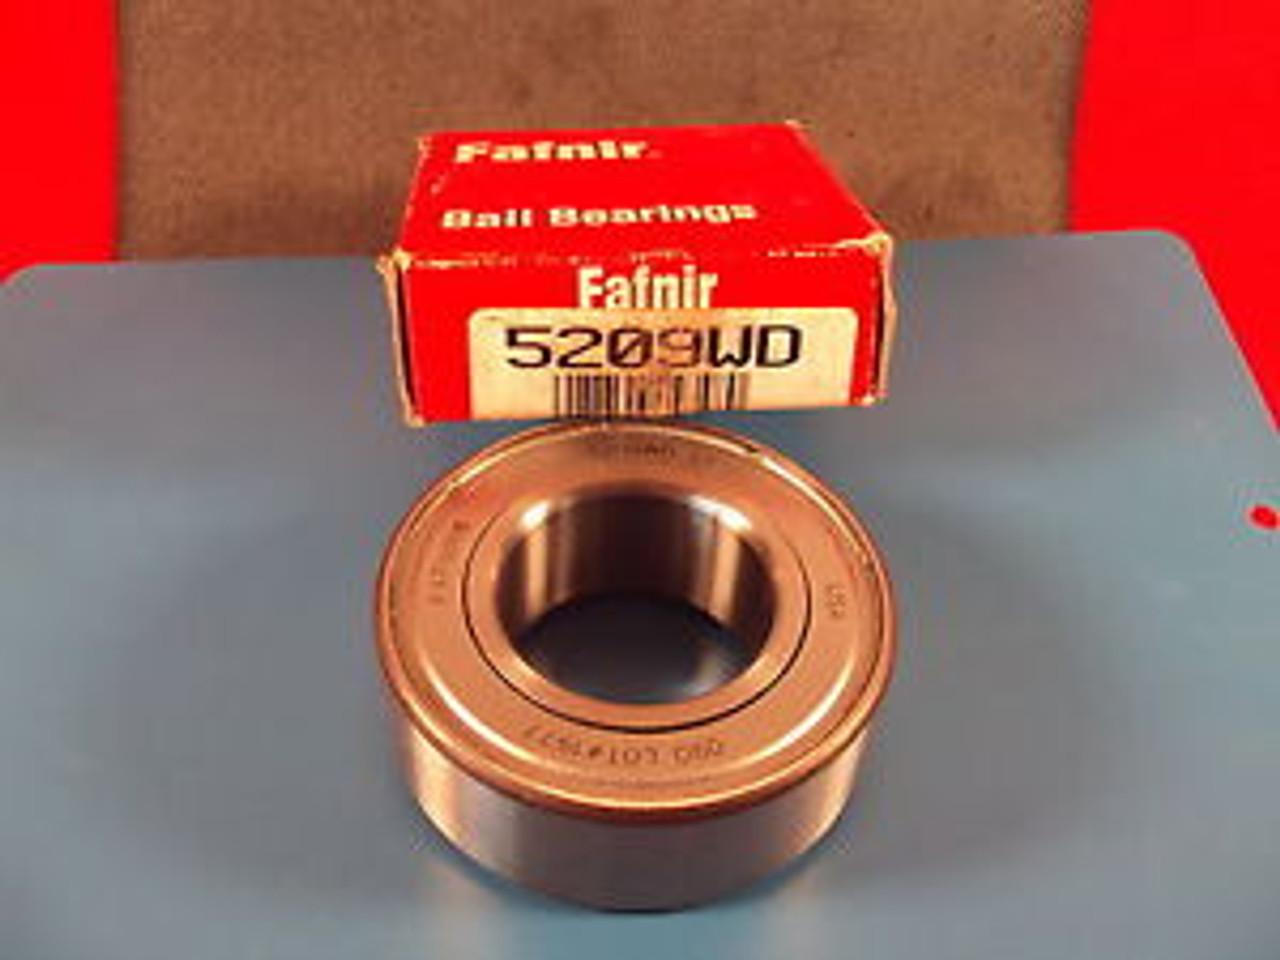 Fafnir 5209 WD, 5209WD, Double Row Ball Bearing,